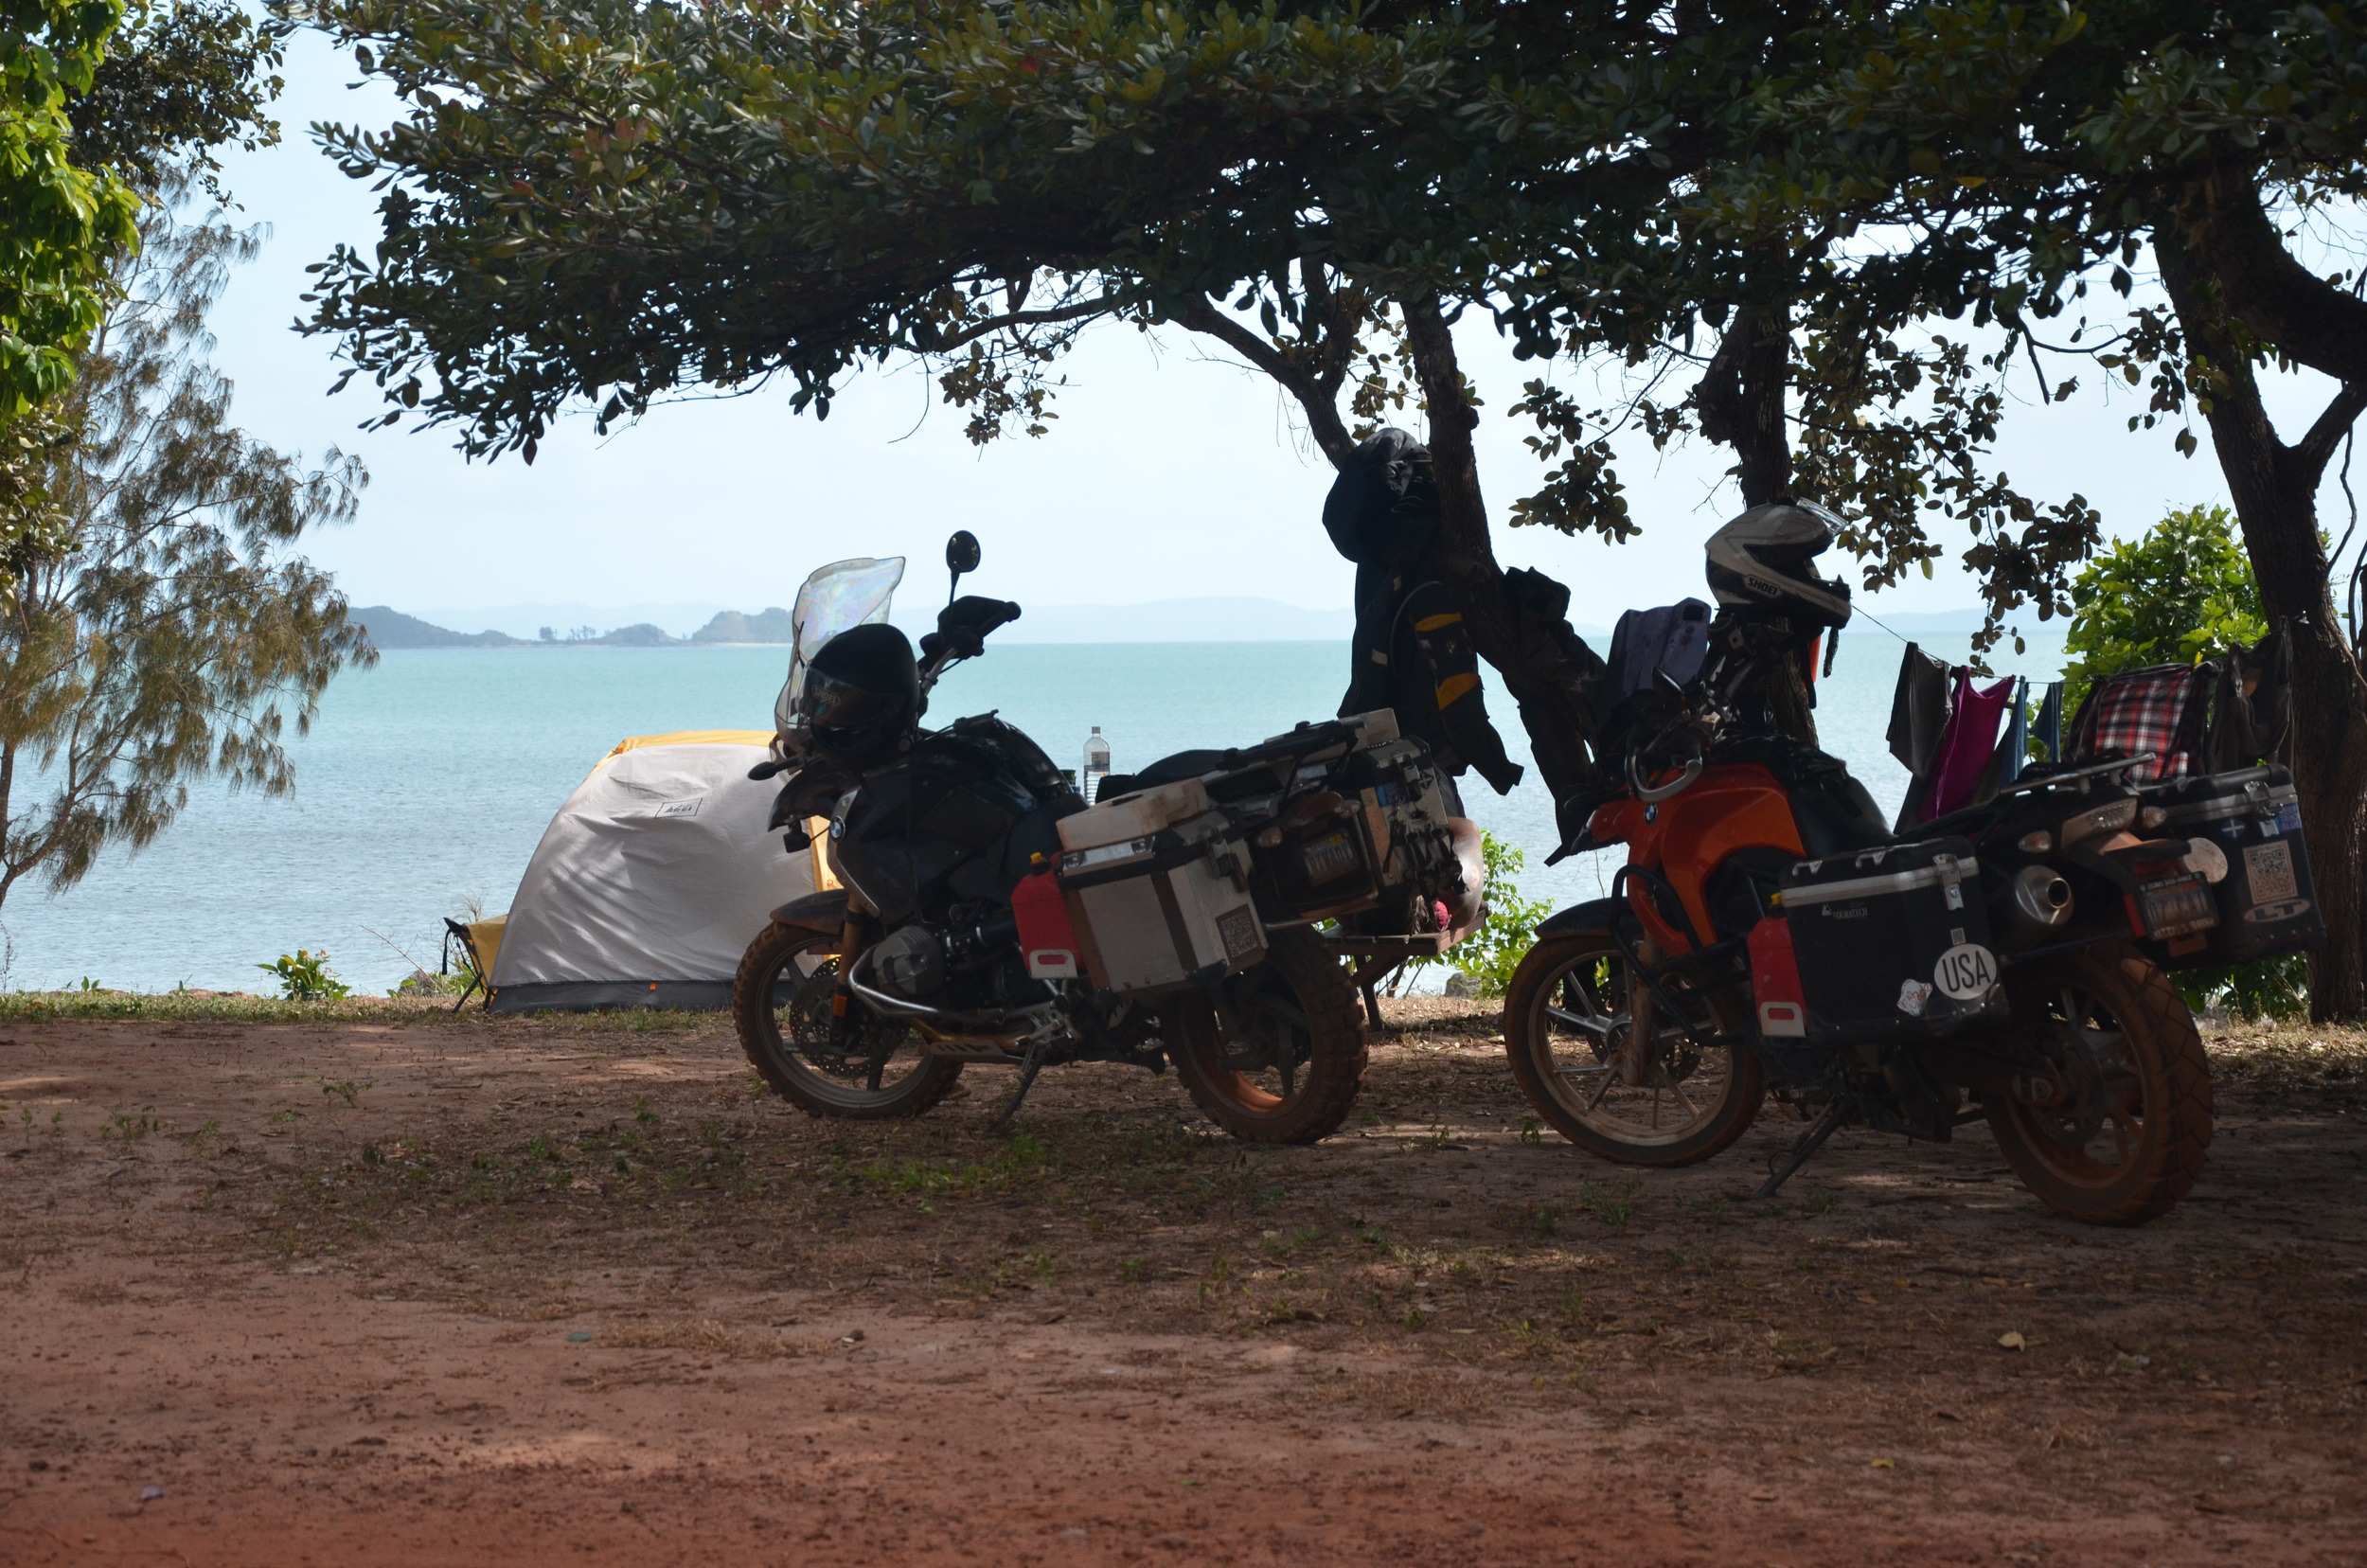 Our campsite at Alau Beach.